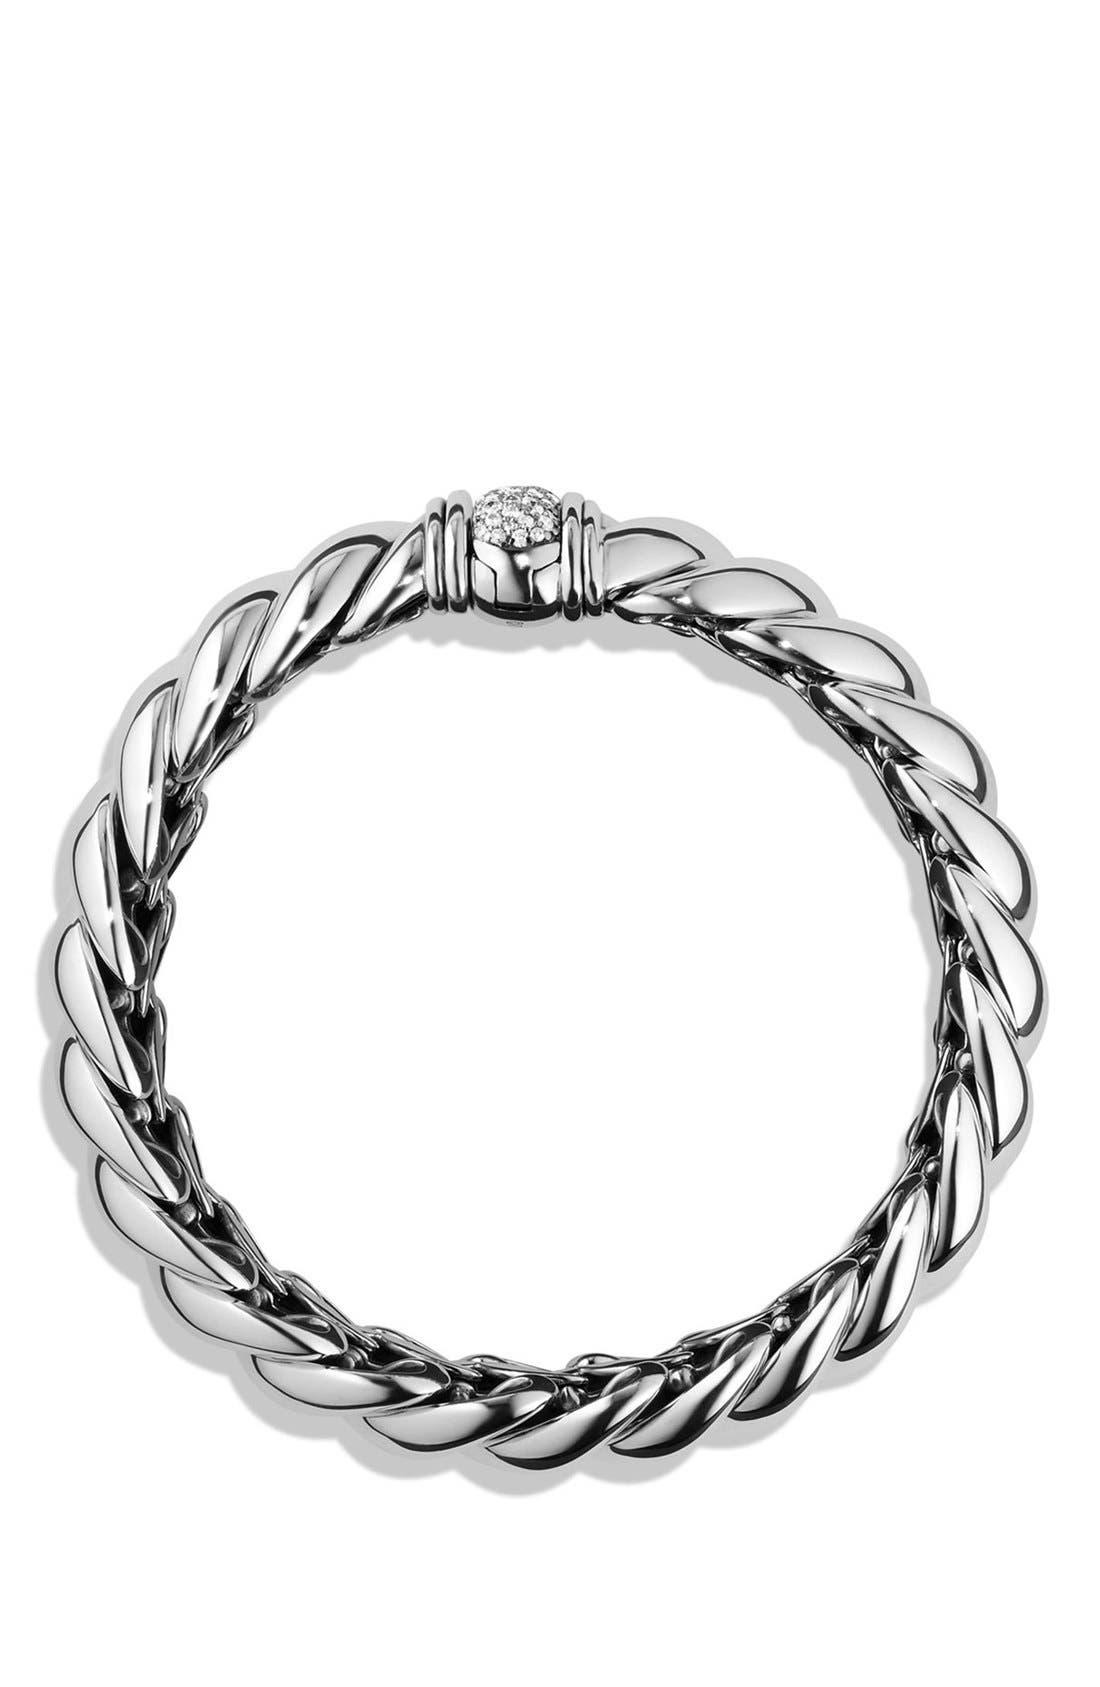 Main Image - David Yurman 'Hampton' Bracelet with Diamonds